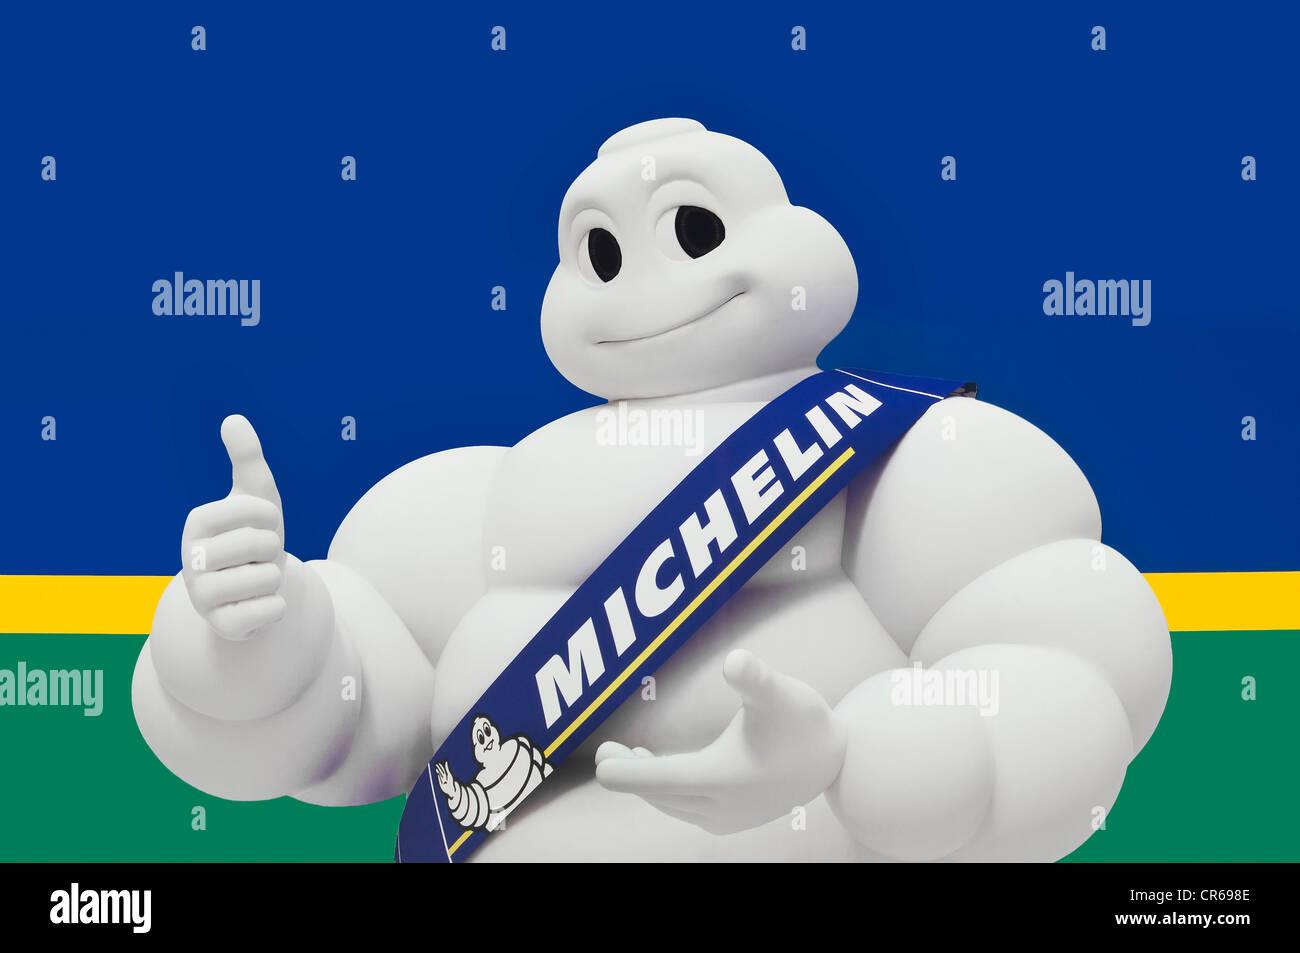 Michelin Man or Bibendum, advertising symbol of the Michelin tyre company - Stock Image